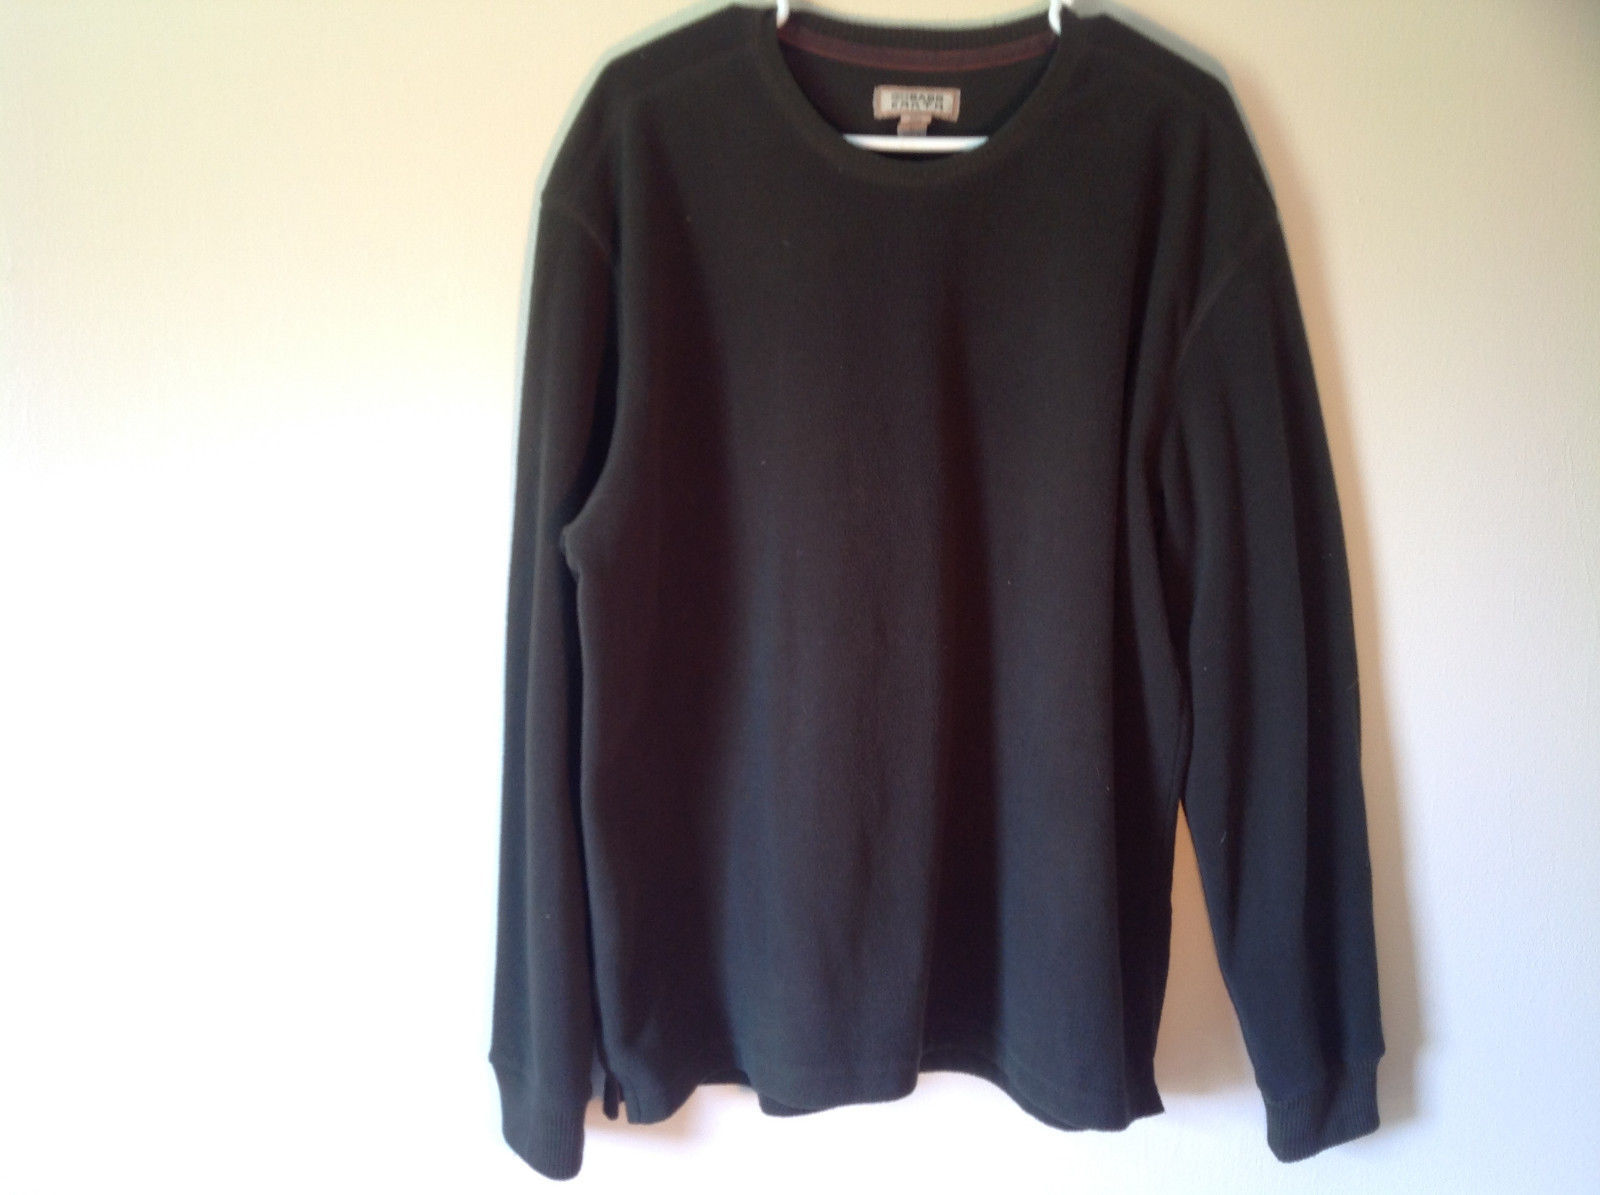 G H Brass Earth Green Micro Fleece Long Sleeve Sweatshirt Size Large